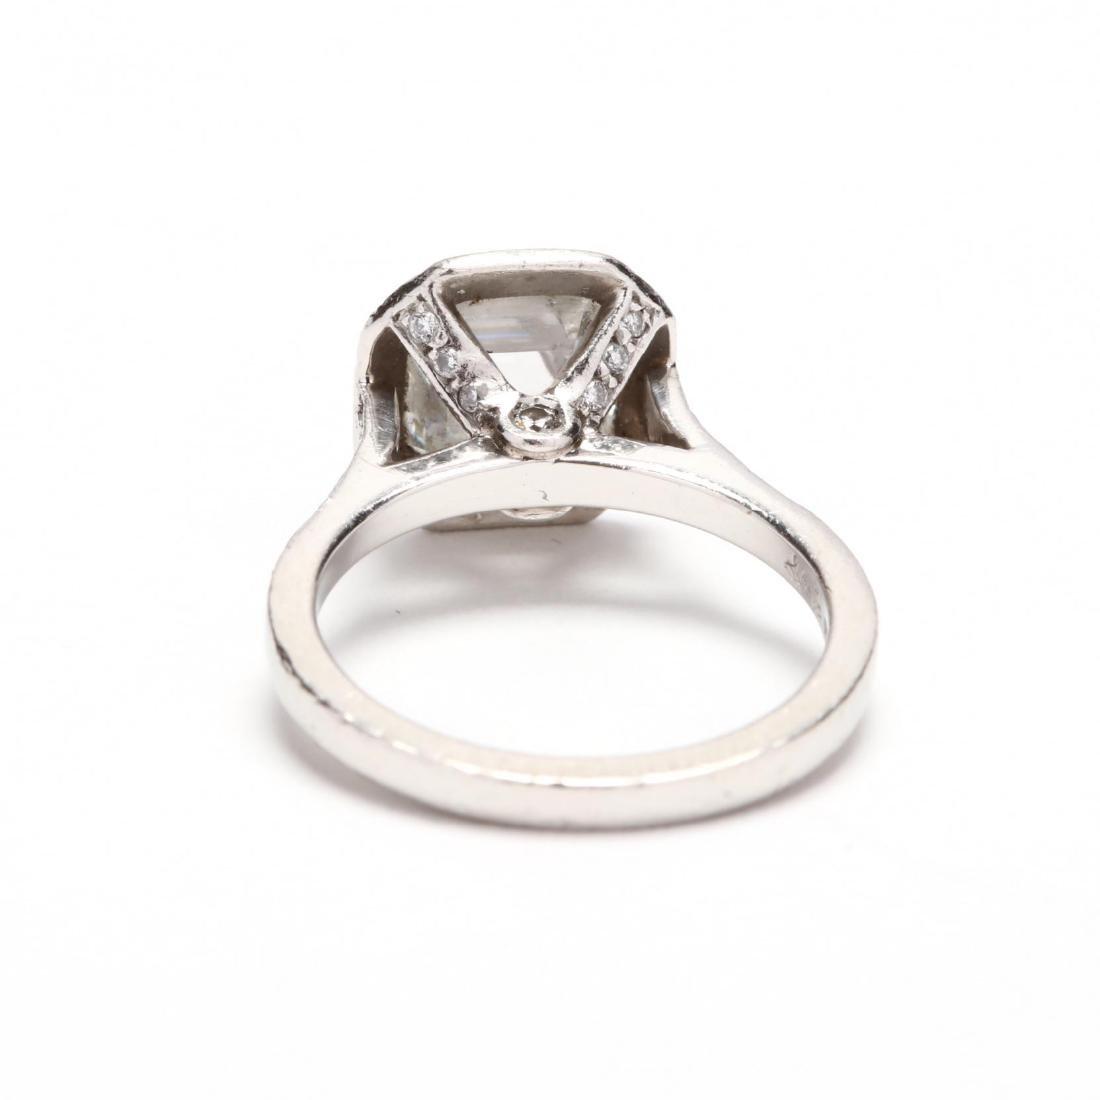 Platinum and Diamond Ring - 3